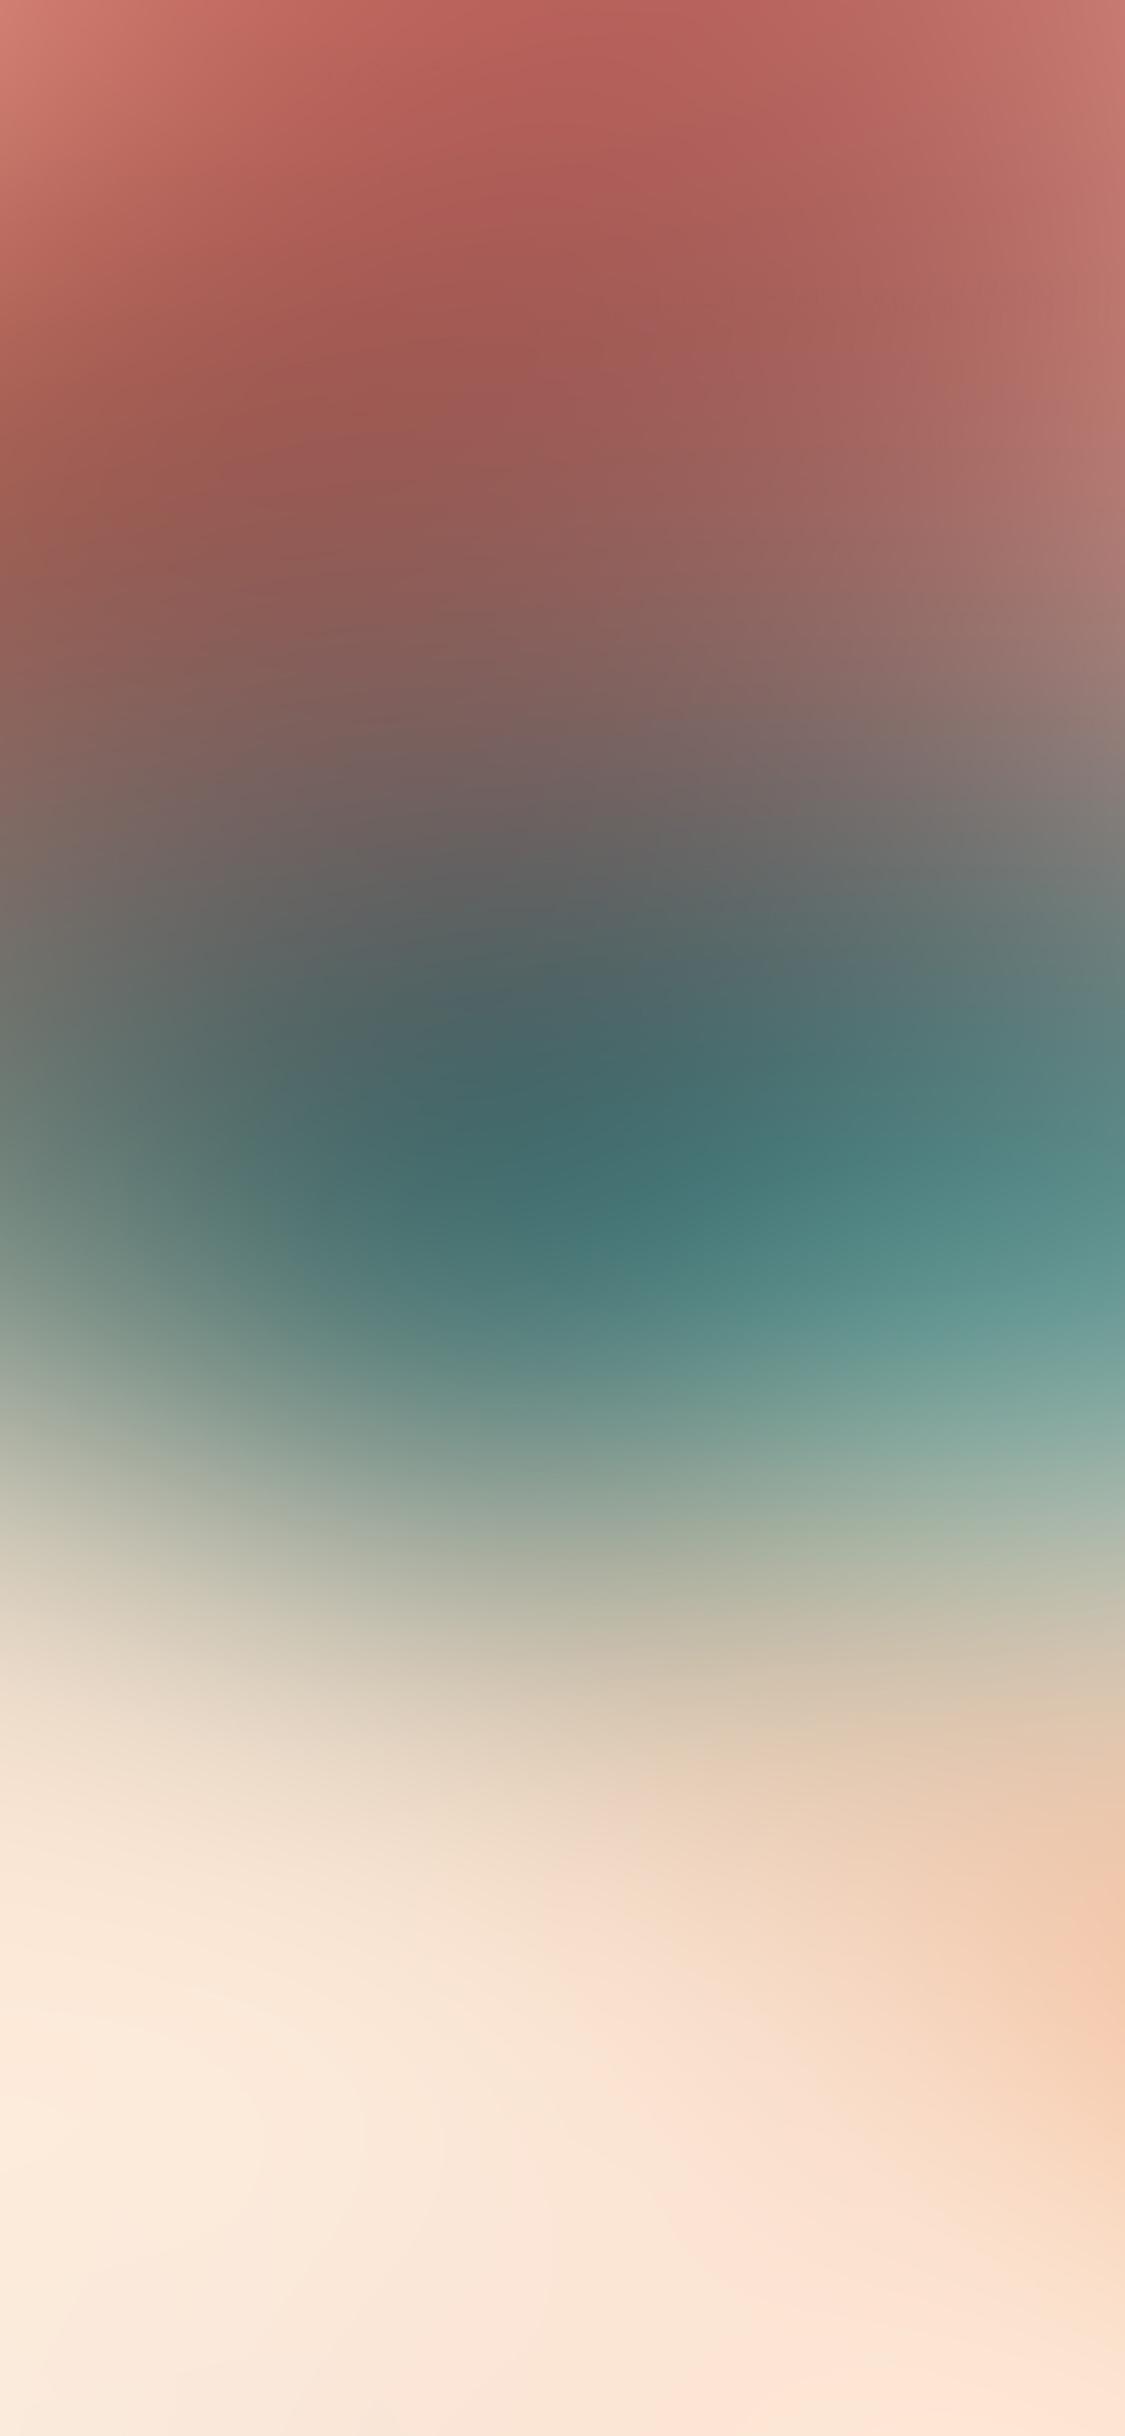 iPhoneXpapers.com-Apple-iPhone-wallpaper-sf06-red-star-craft-gradation-blur